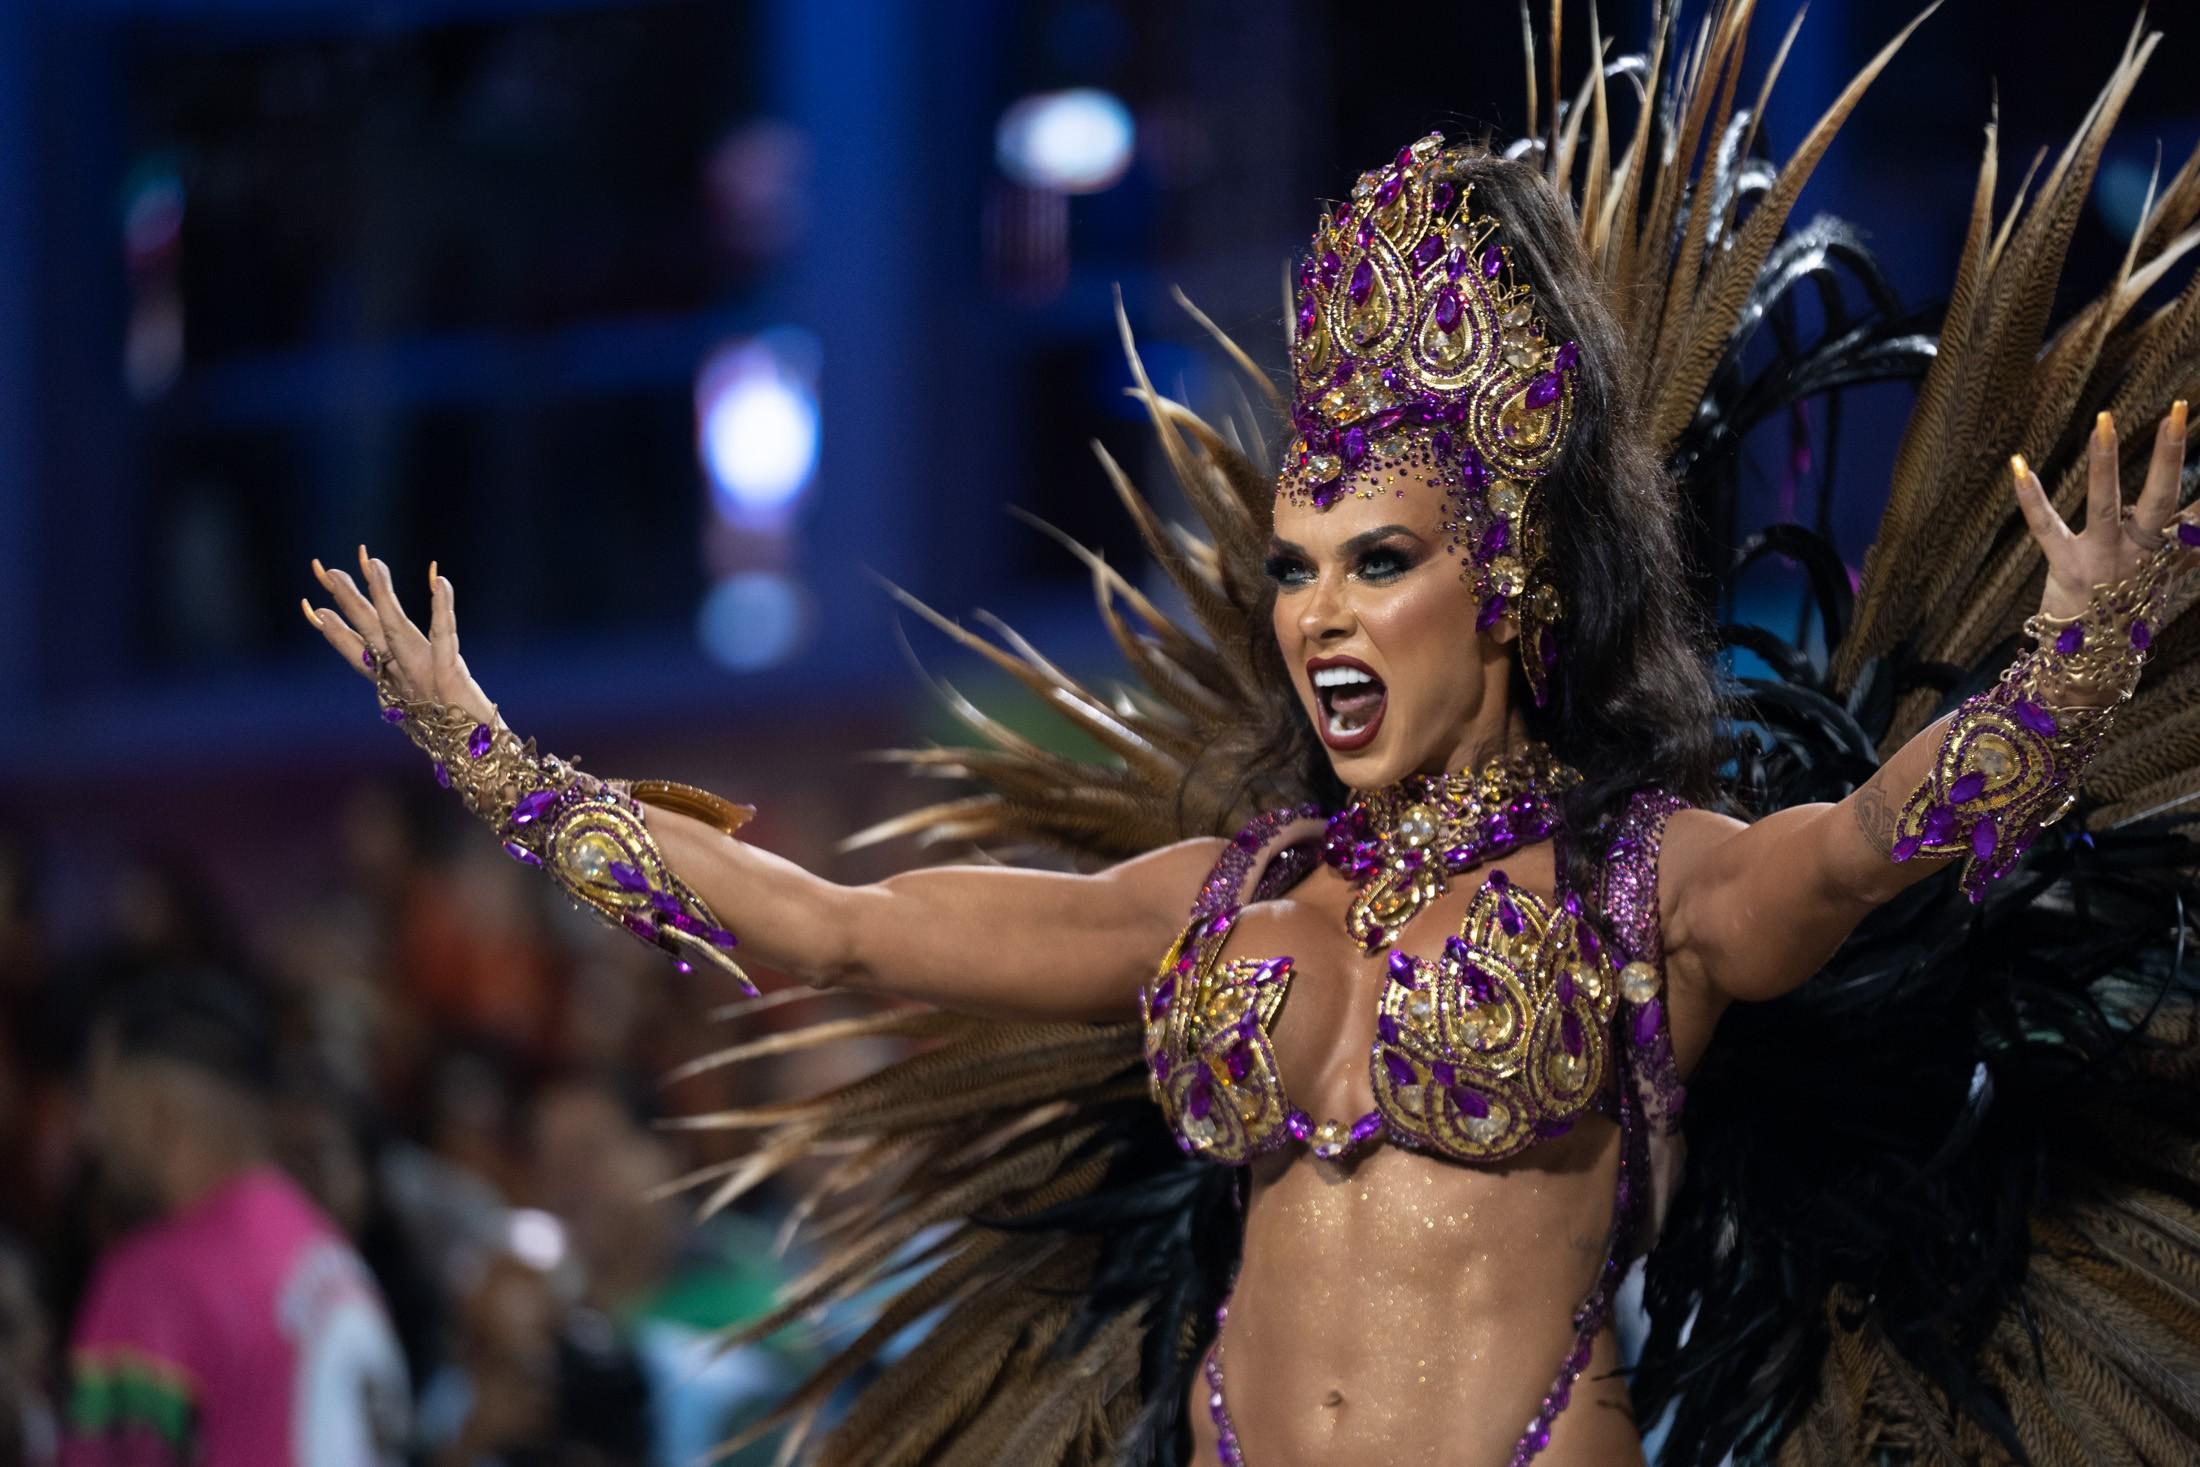 'Estou toda arrepiada', diz Renata Spallicci após estreia como rainha da bateria da Barroca Zona Sul